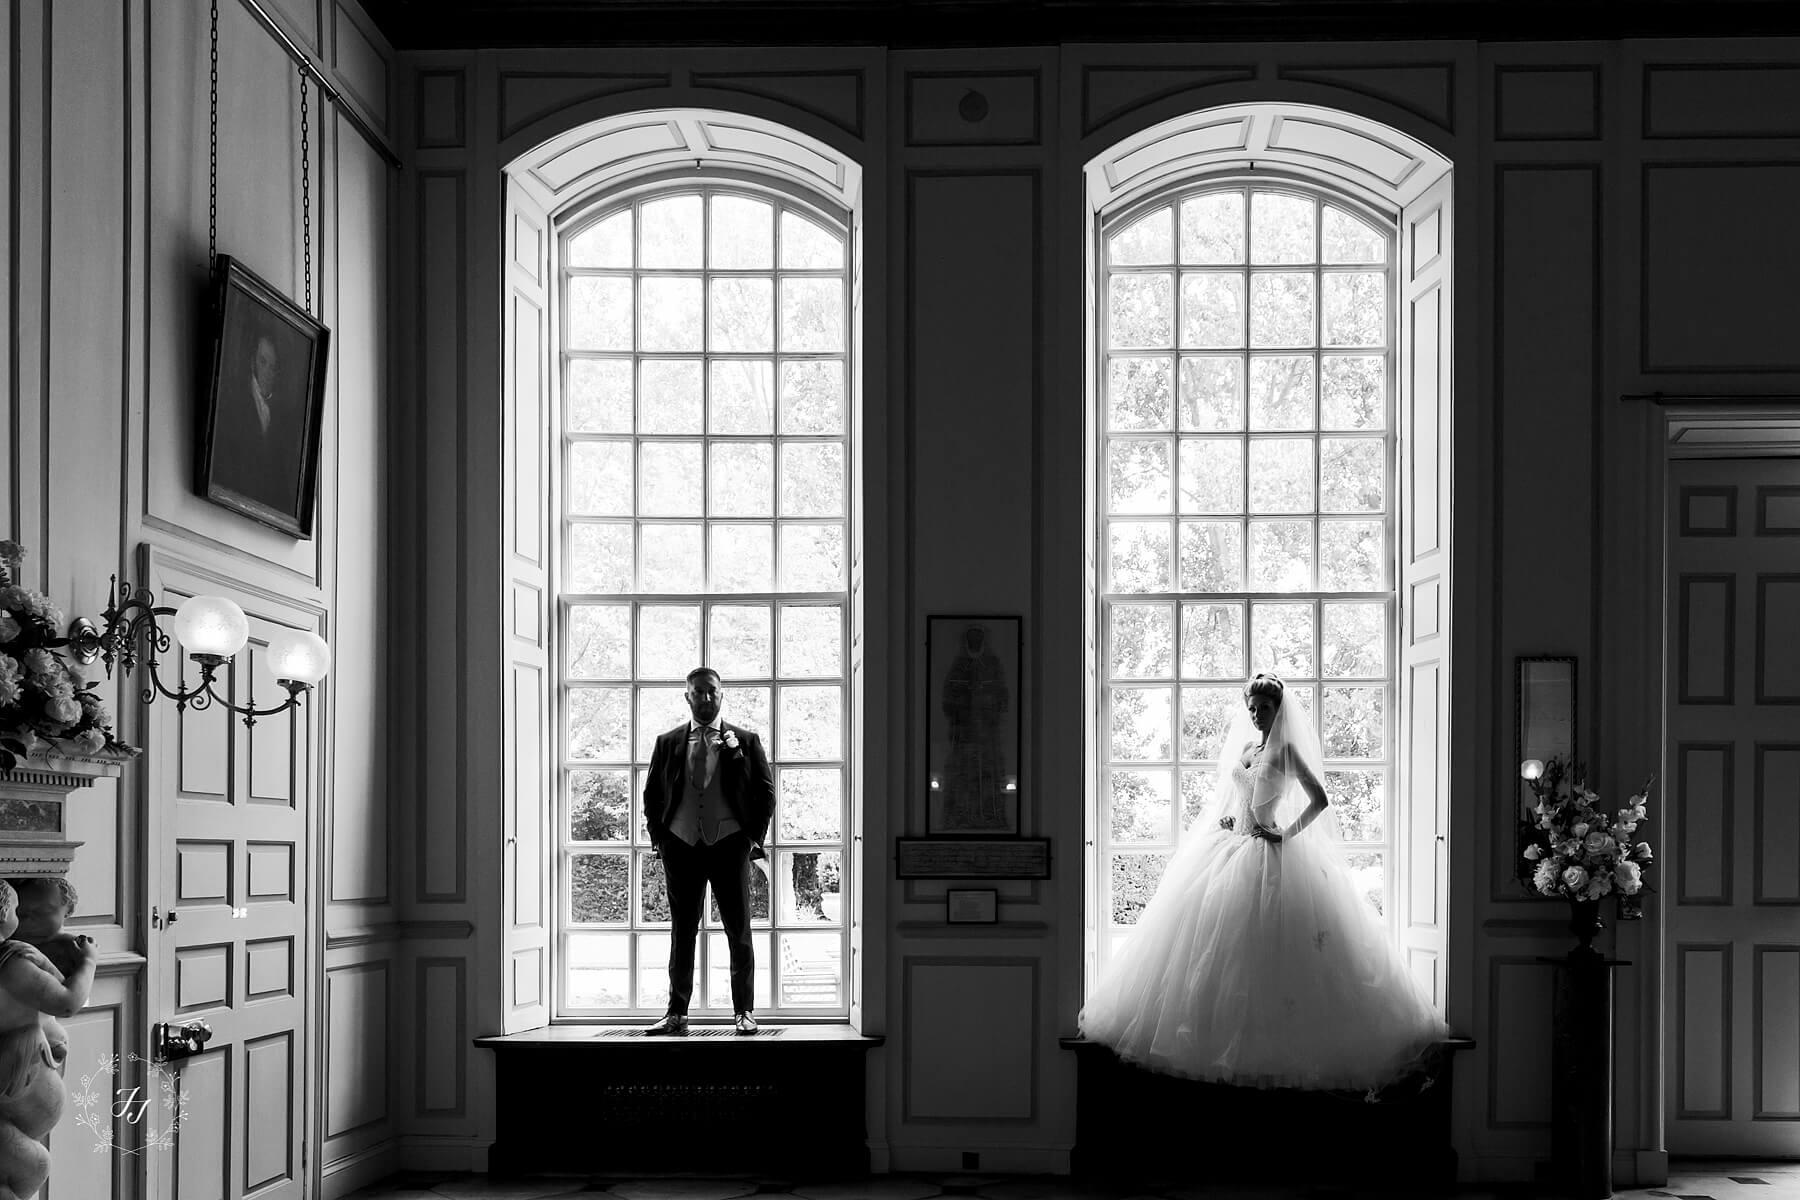 Mrs Hinch Wedding Photograph at Gosfield Hall